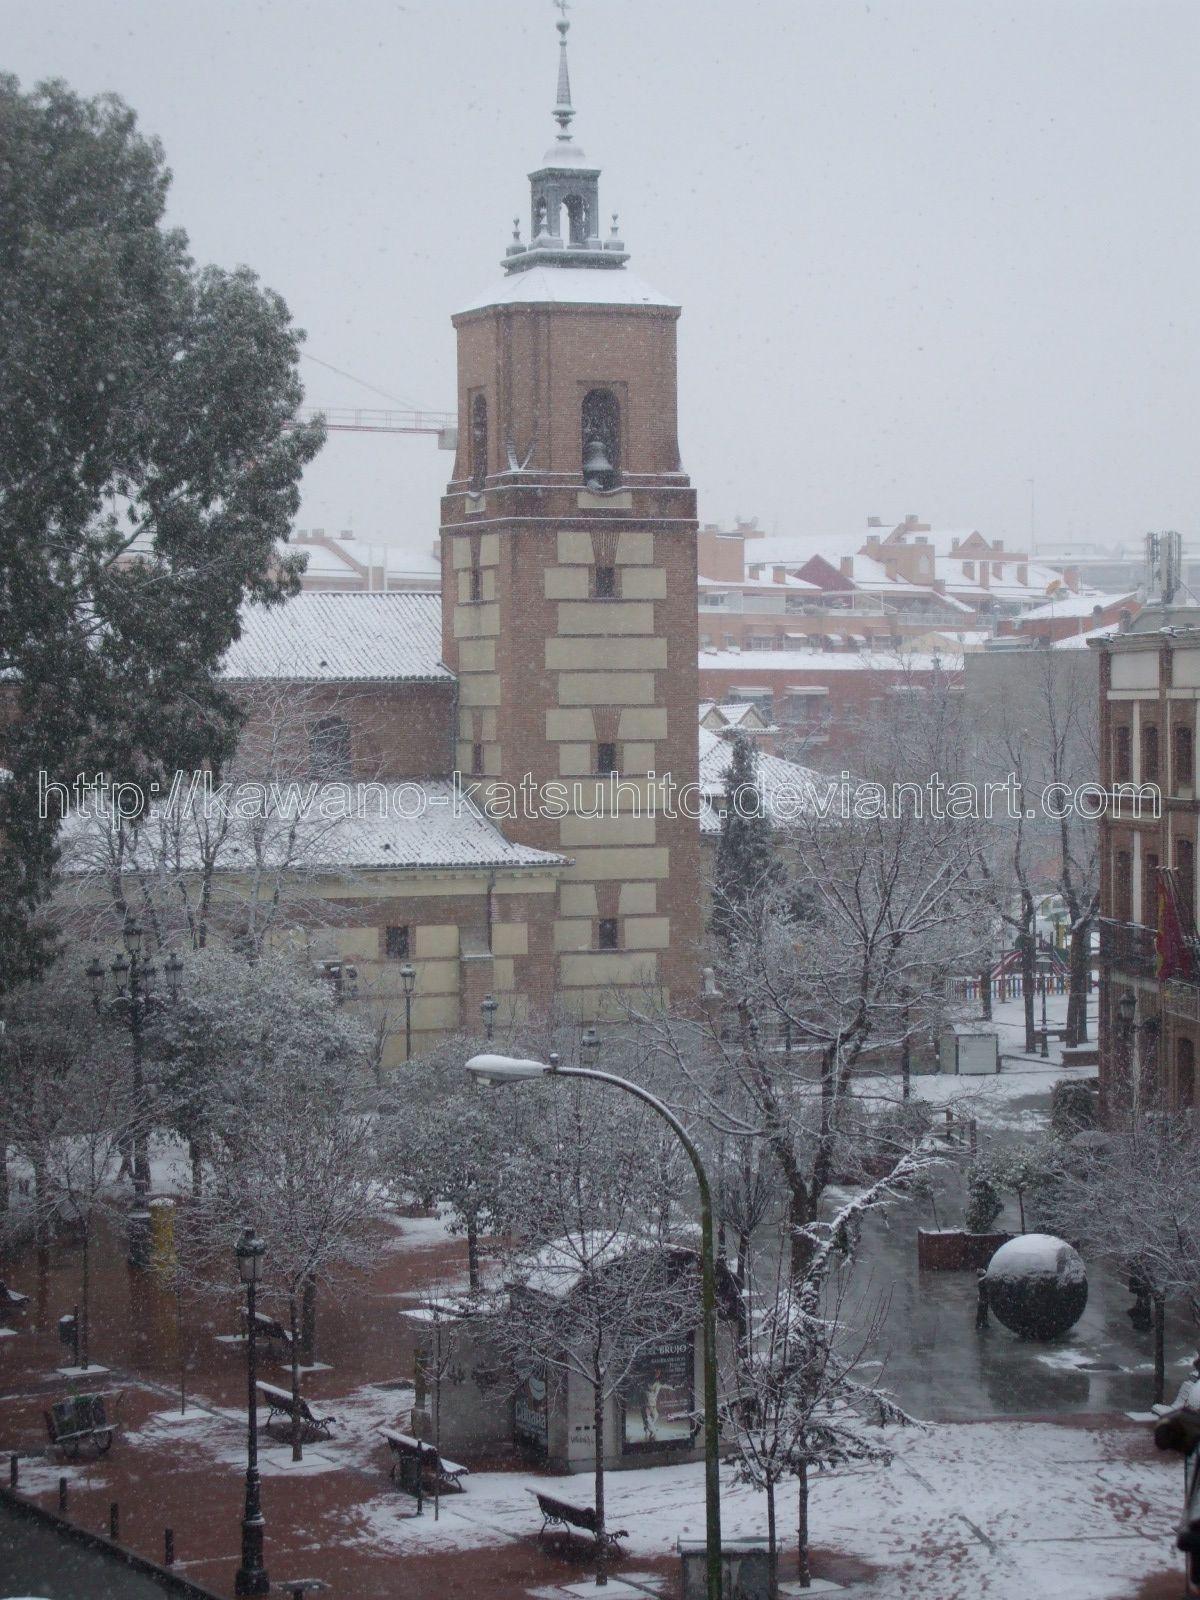 Snow in Madrid, 9-1-2009: 3